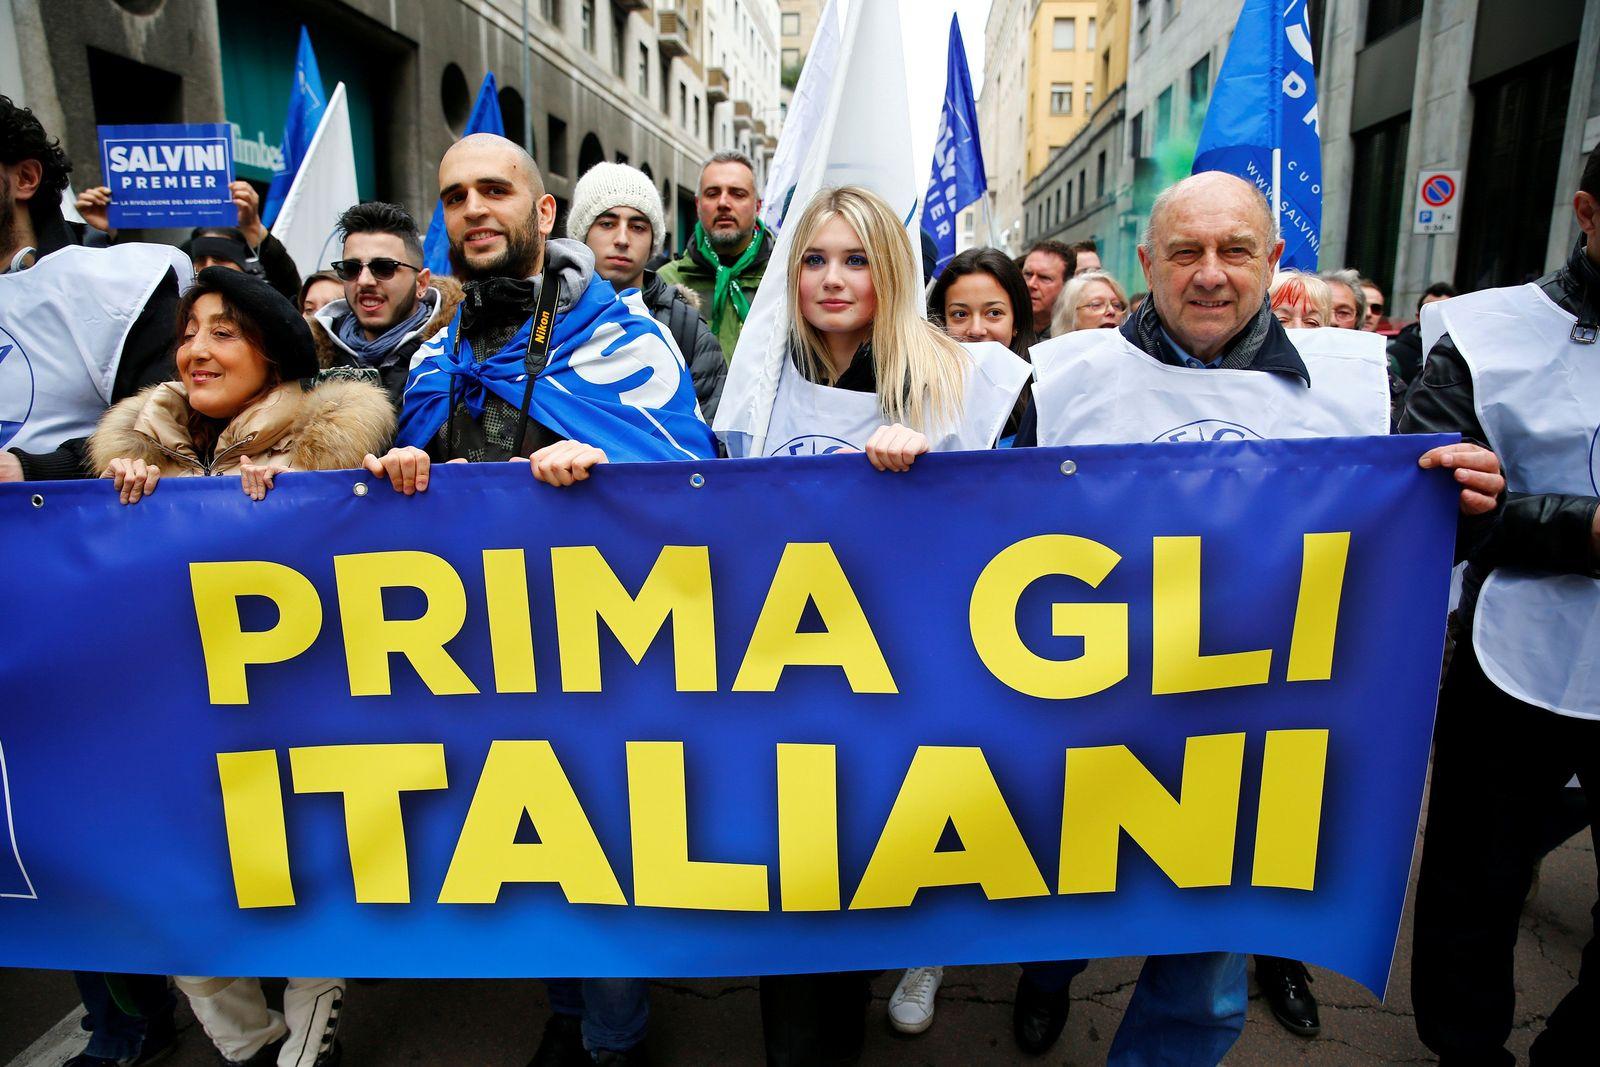 ITALY-ELECTION/LEAGUE